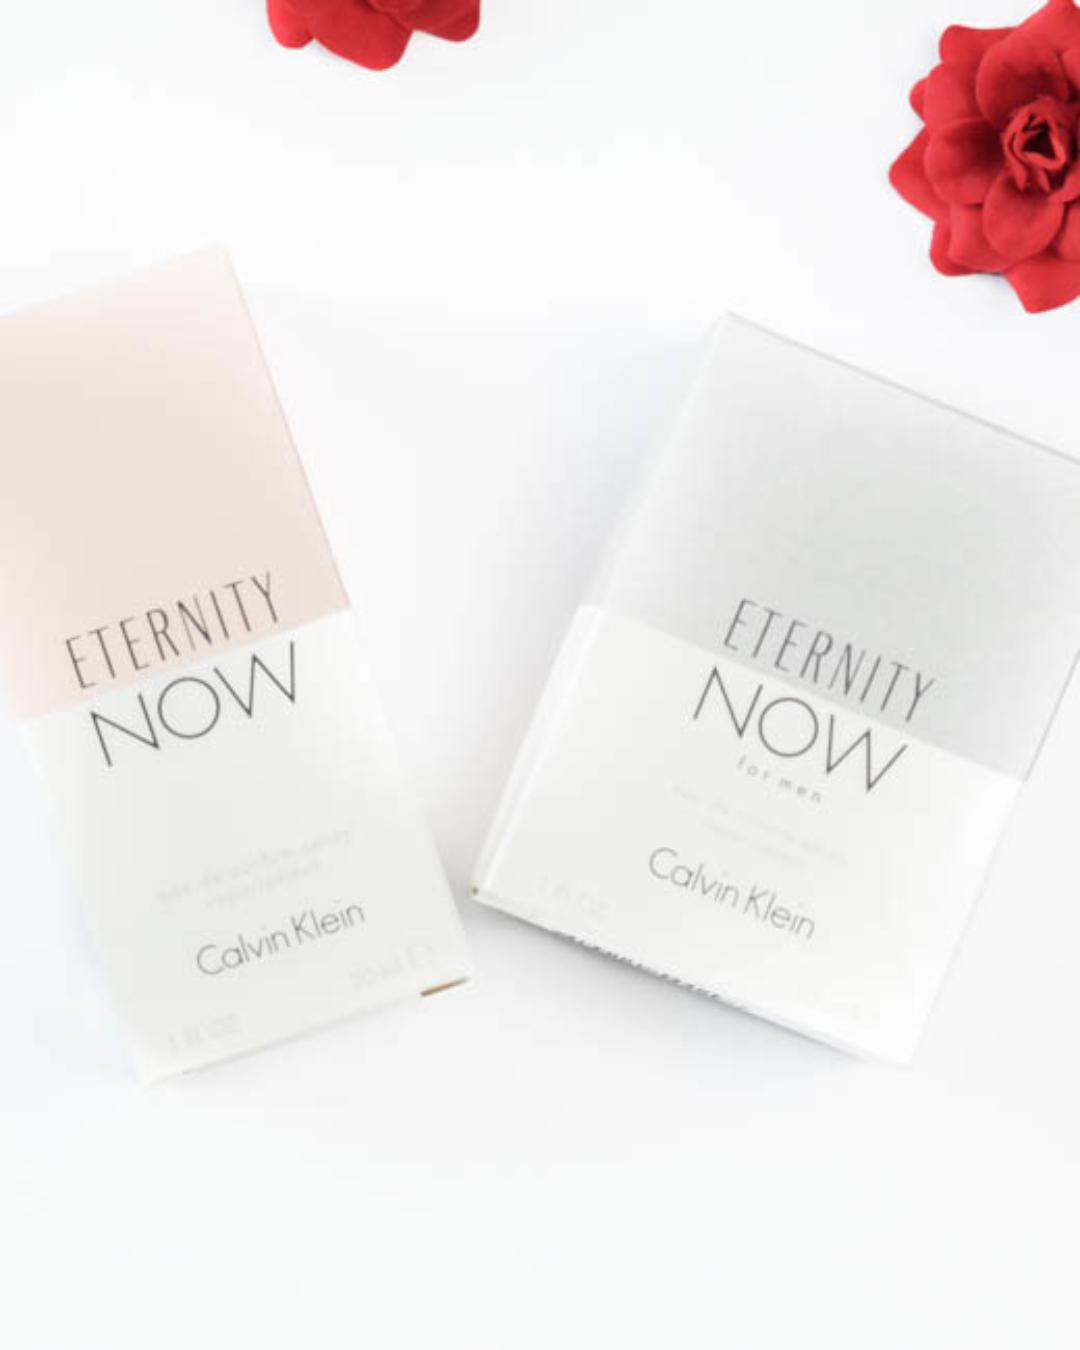 Geschenk Idee Calvin Klein For Him & Her